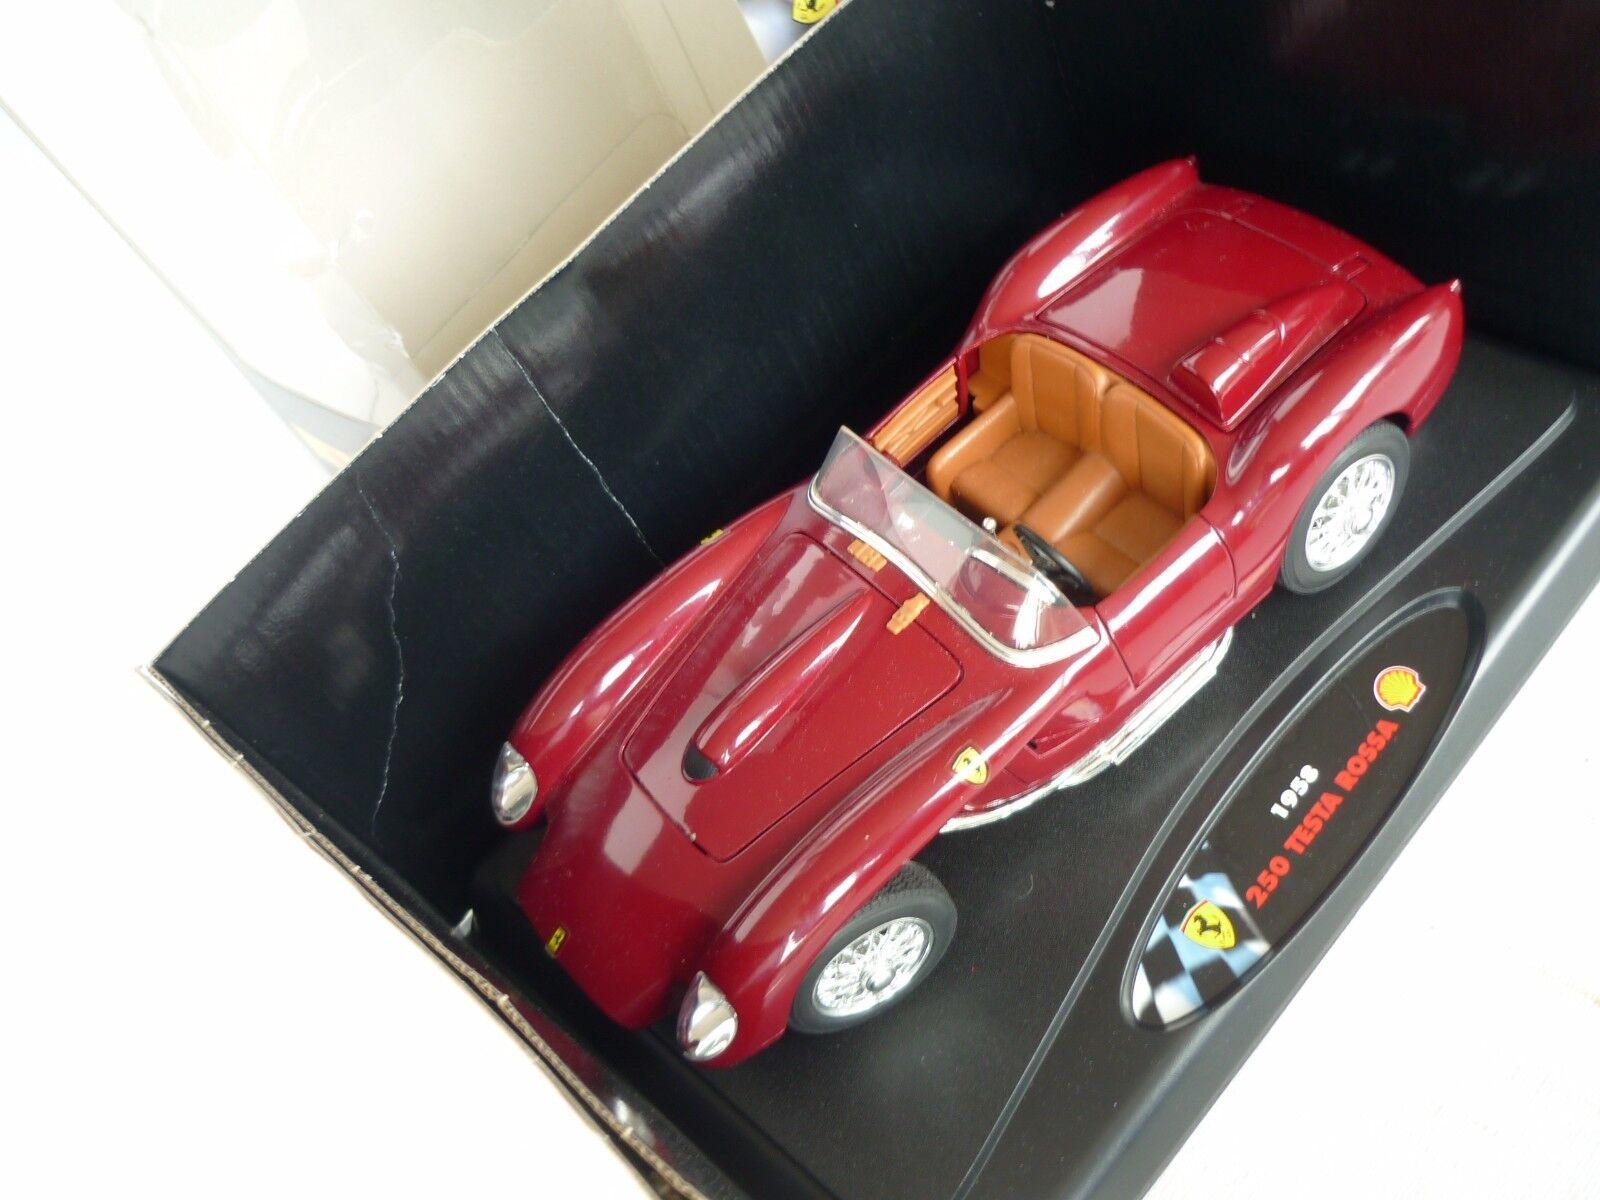 Shell Classico Ferrari Testarossa 1958 in 1 18 mit passendem Shell-Tankfass dazu